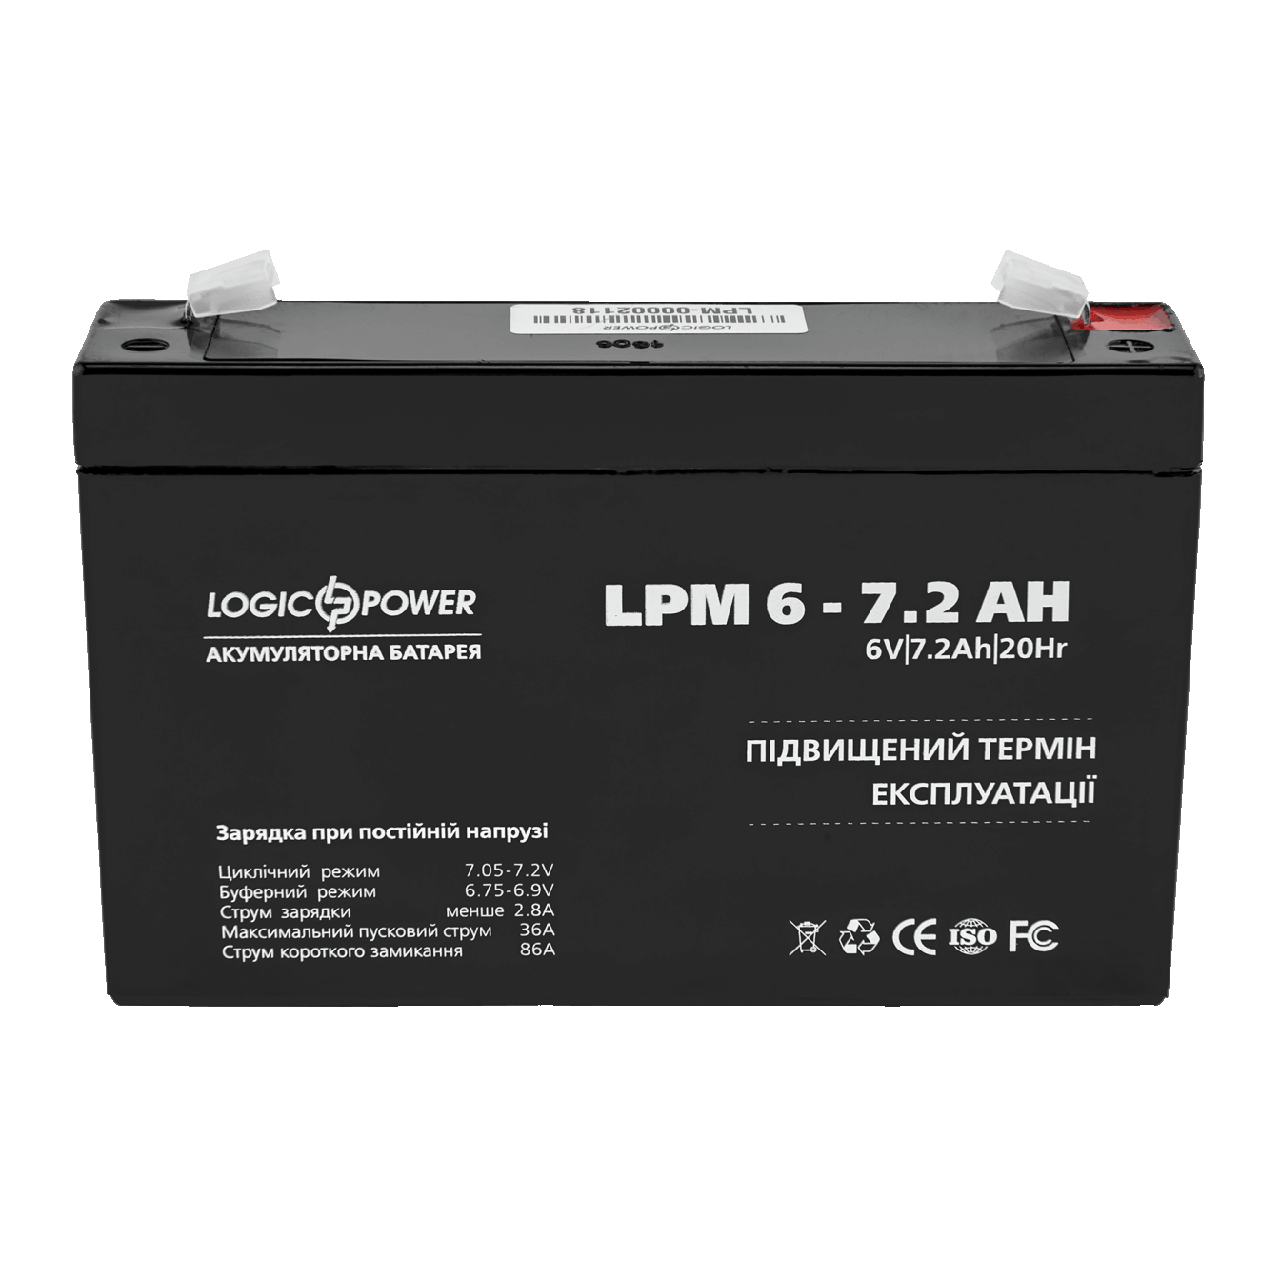 Logicpower 6V 7.2Ah